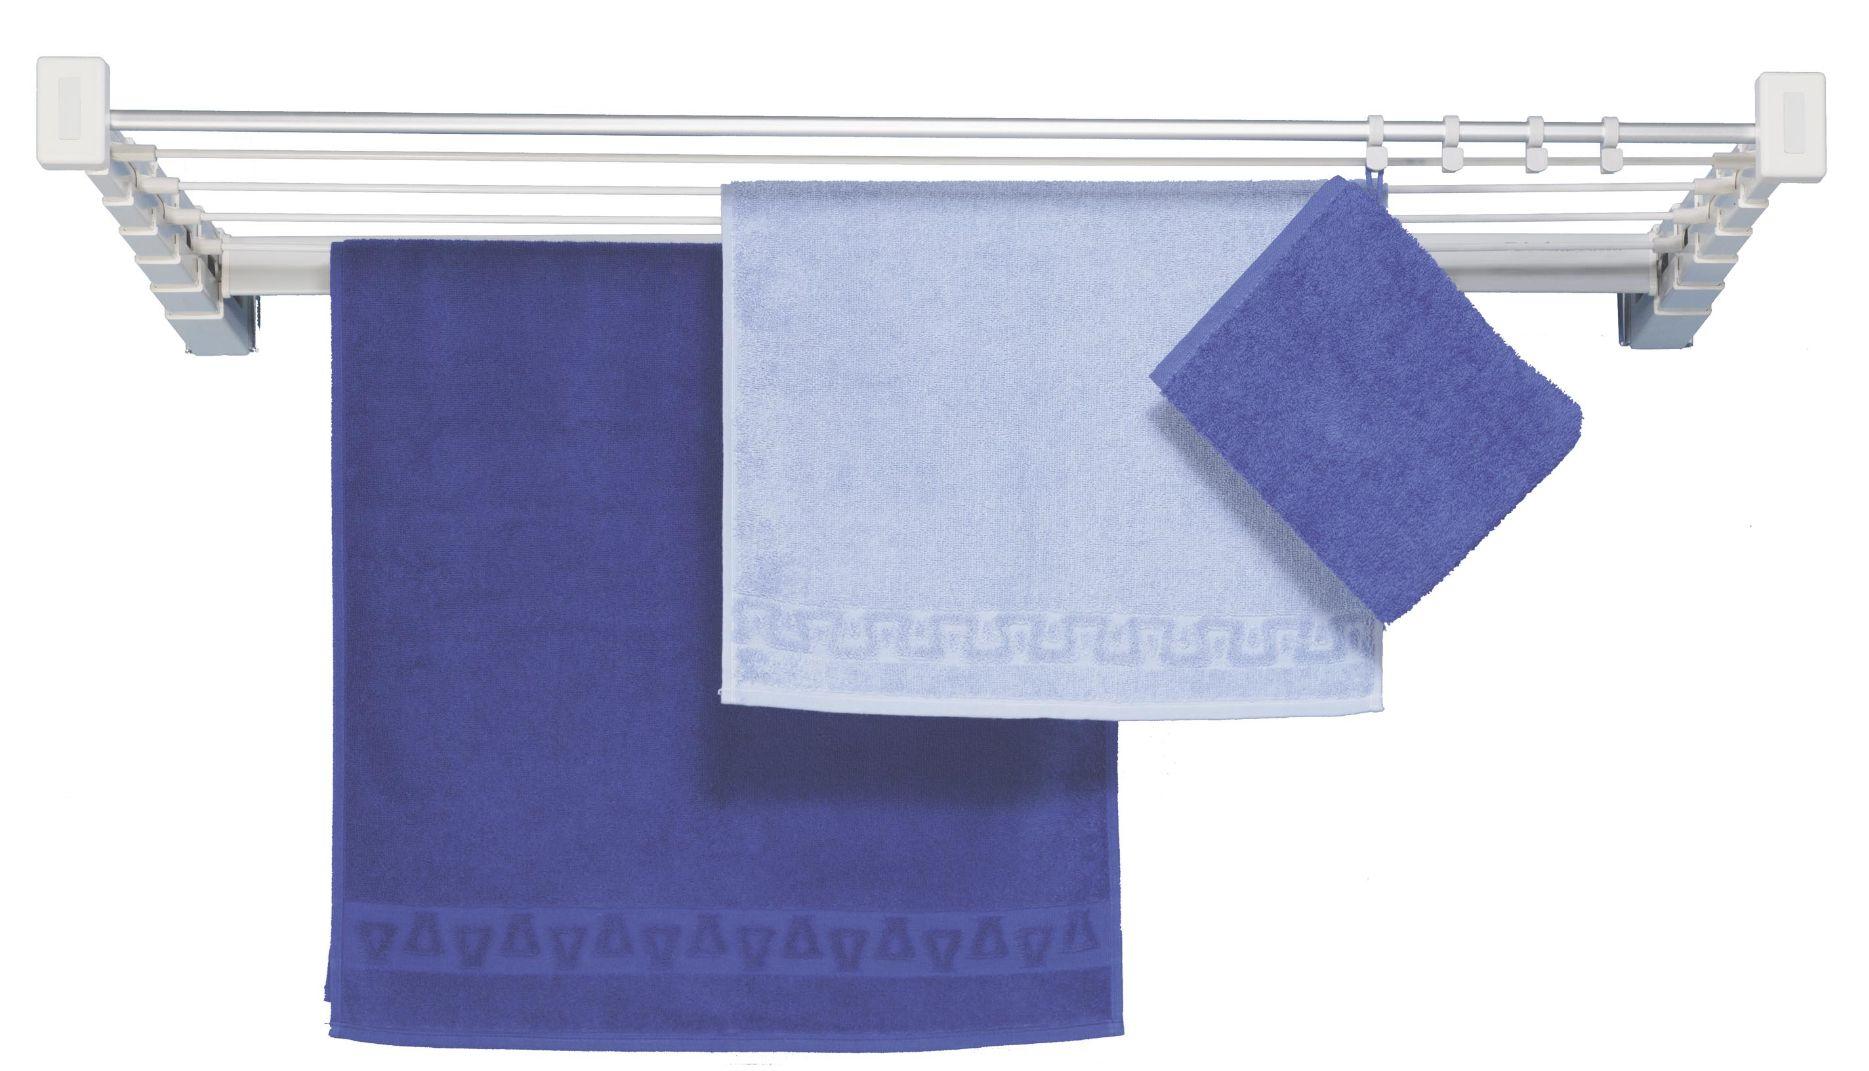 Stewi Teleskop Prestige Clothes Drying Rack